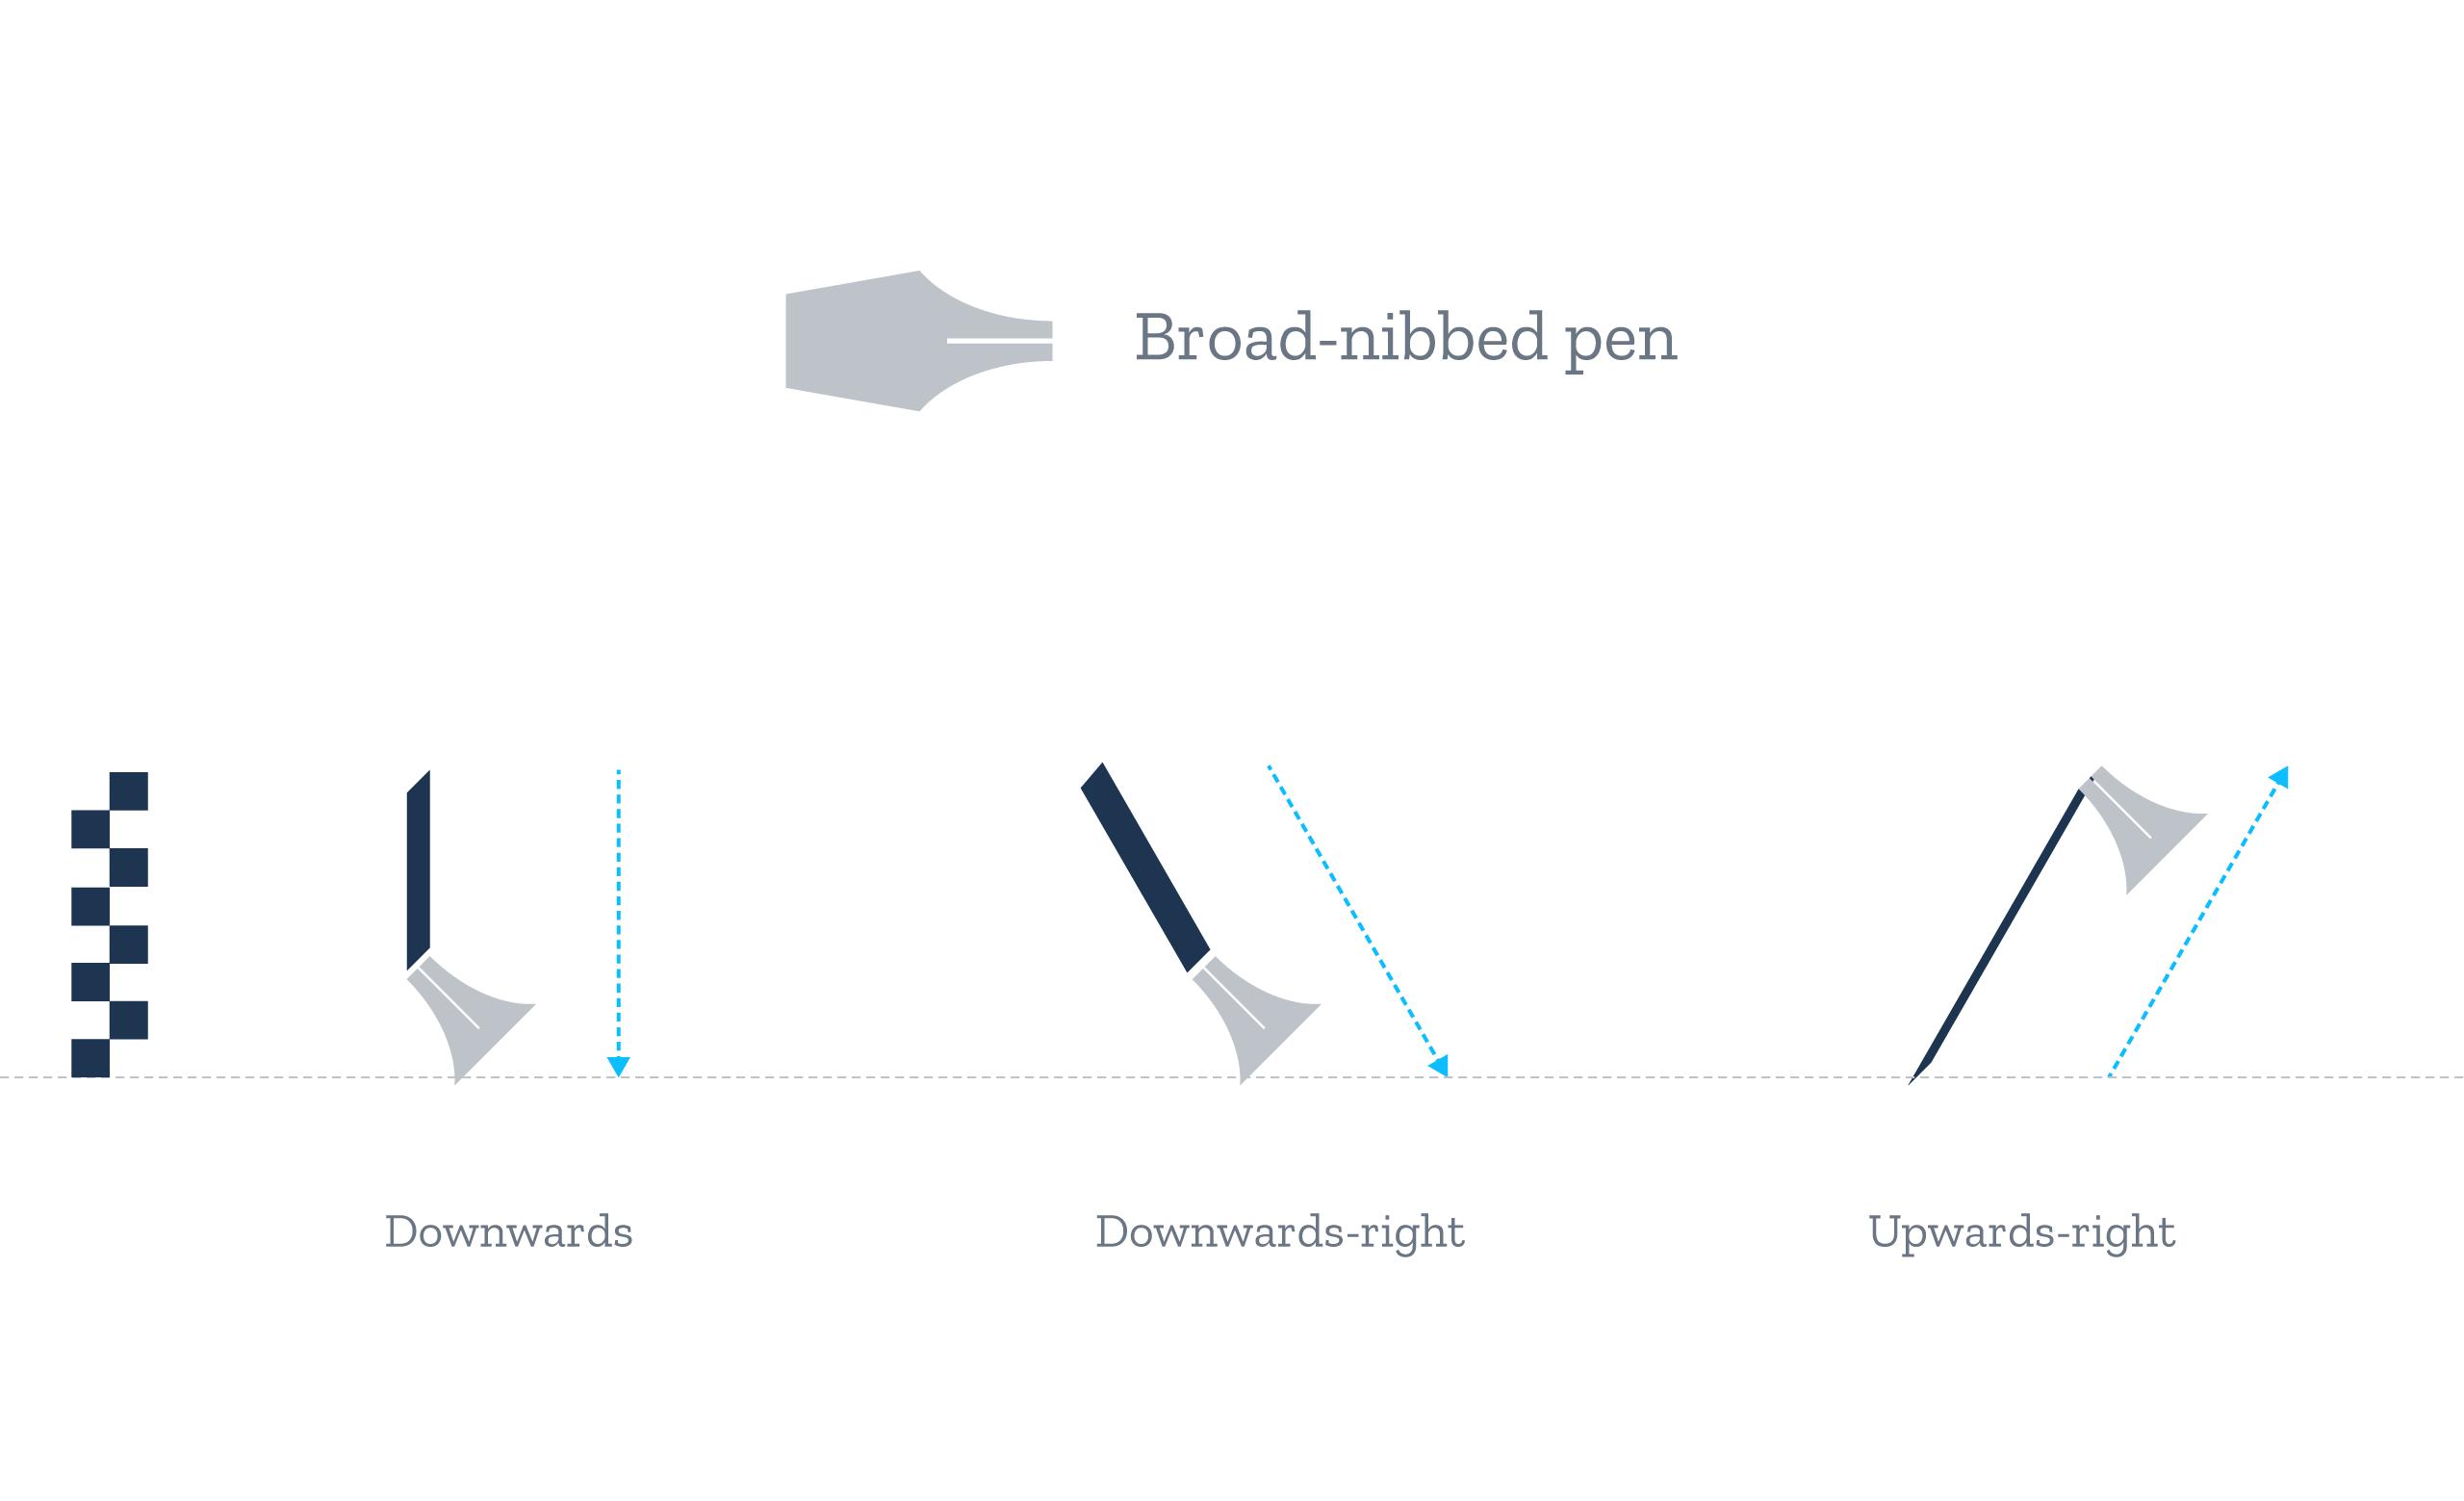 broad-nibbed pen